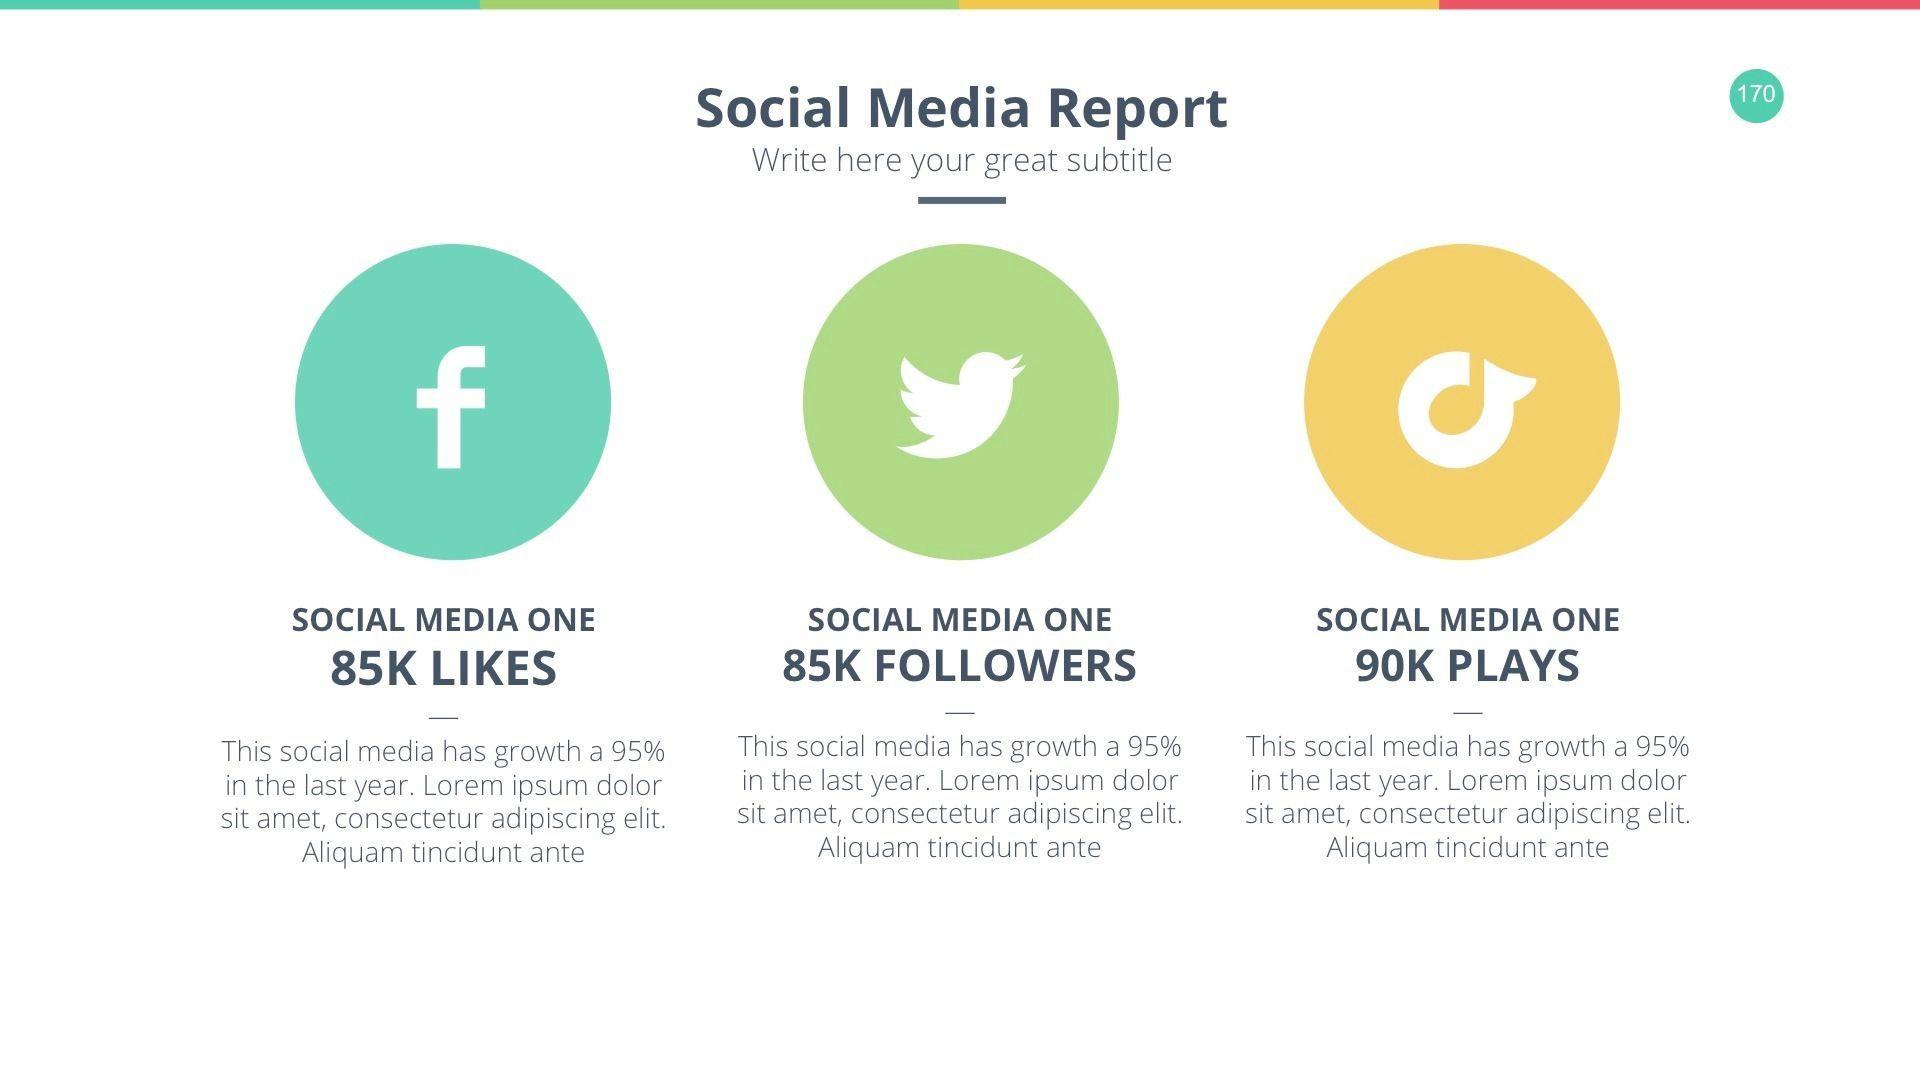 000 Best Social Media Powerpoint Template Highest Quality  Templates Report Free Social-media-marketing-powerpoint-templateFull